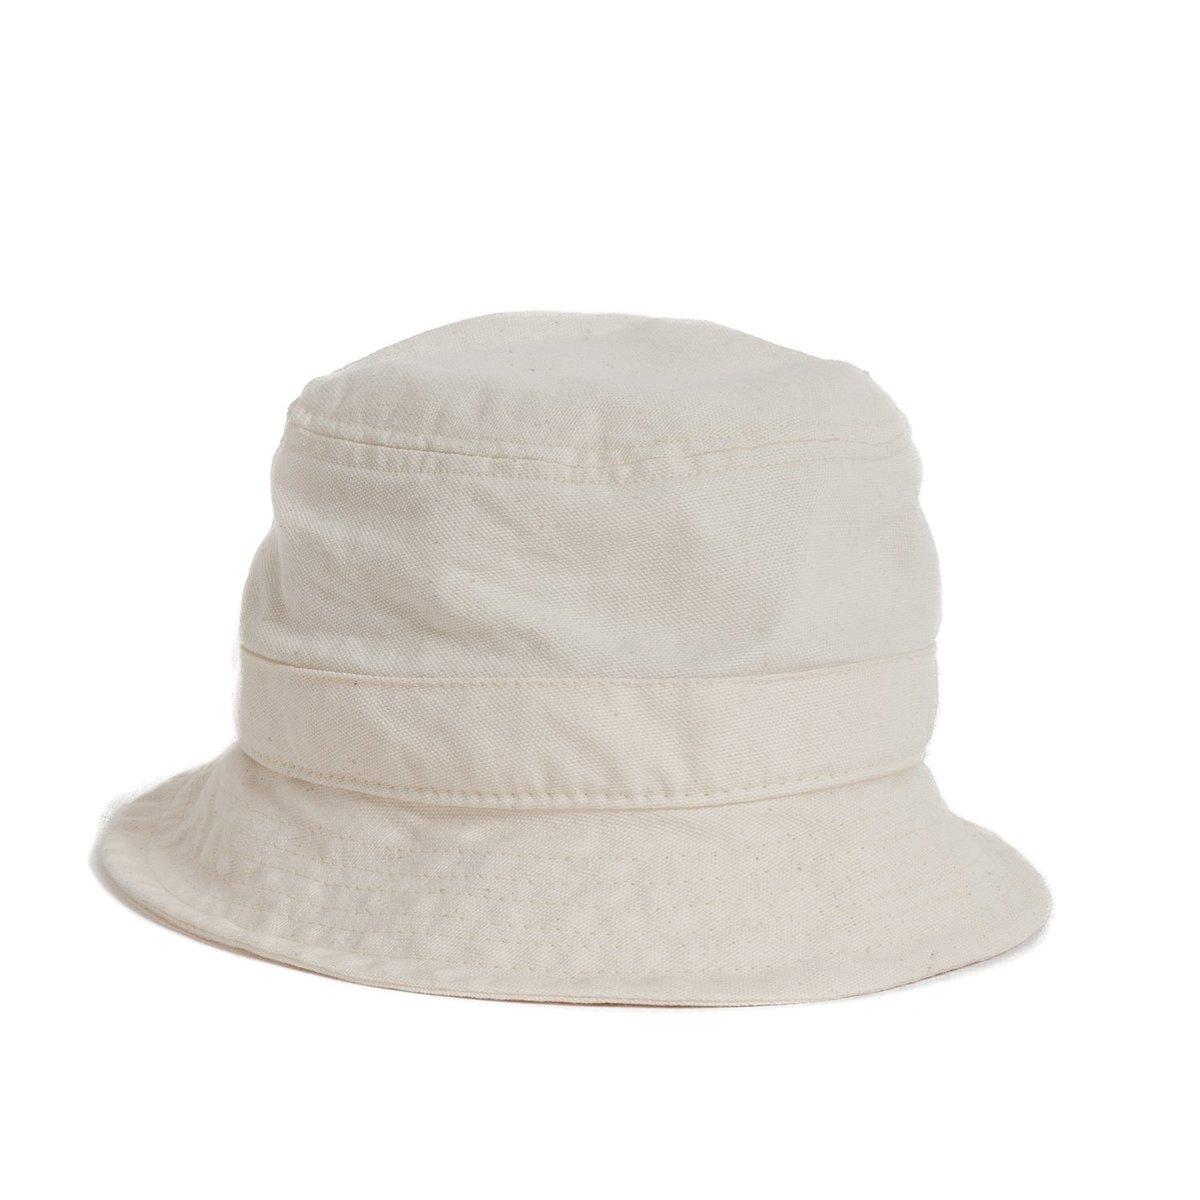 Corridor Bucket Hat - White Canvas  54c95caadda